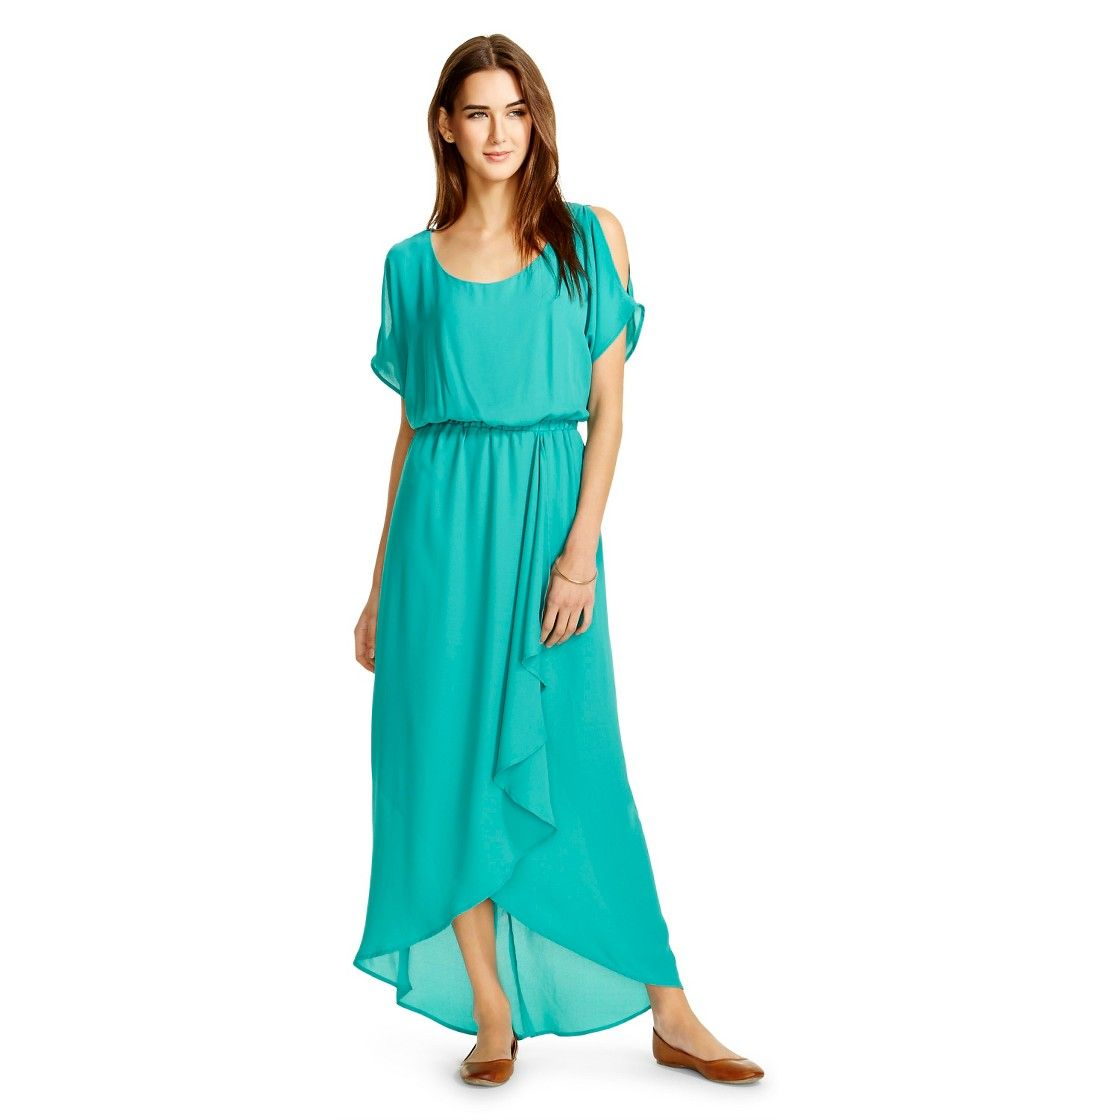 Cold Shoulder Chiffon Maxi Dress - Mossimo | My Style | Pinterest ...